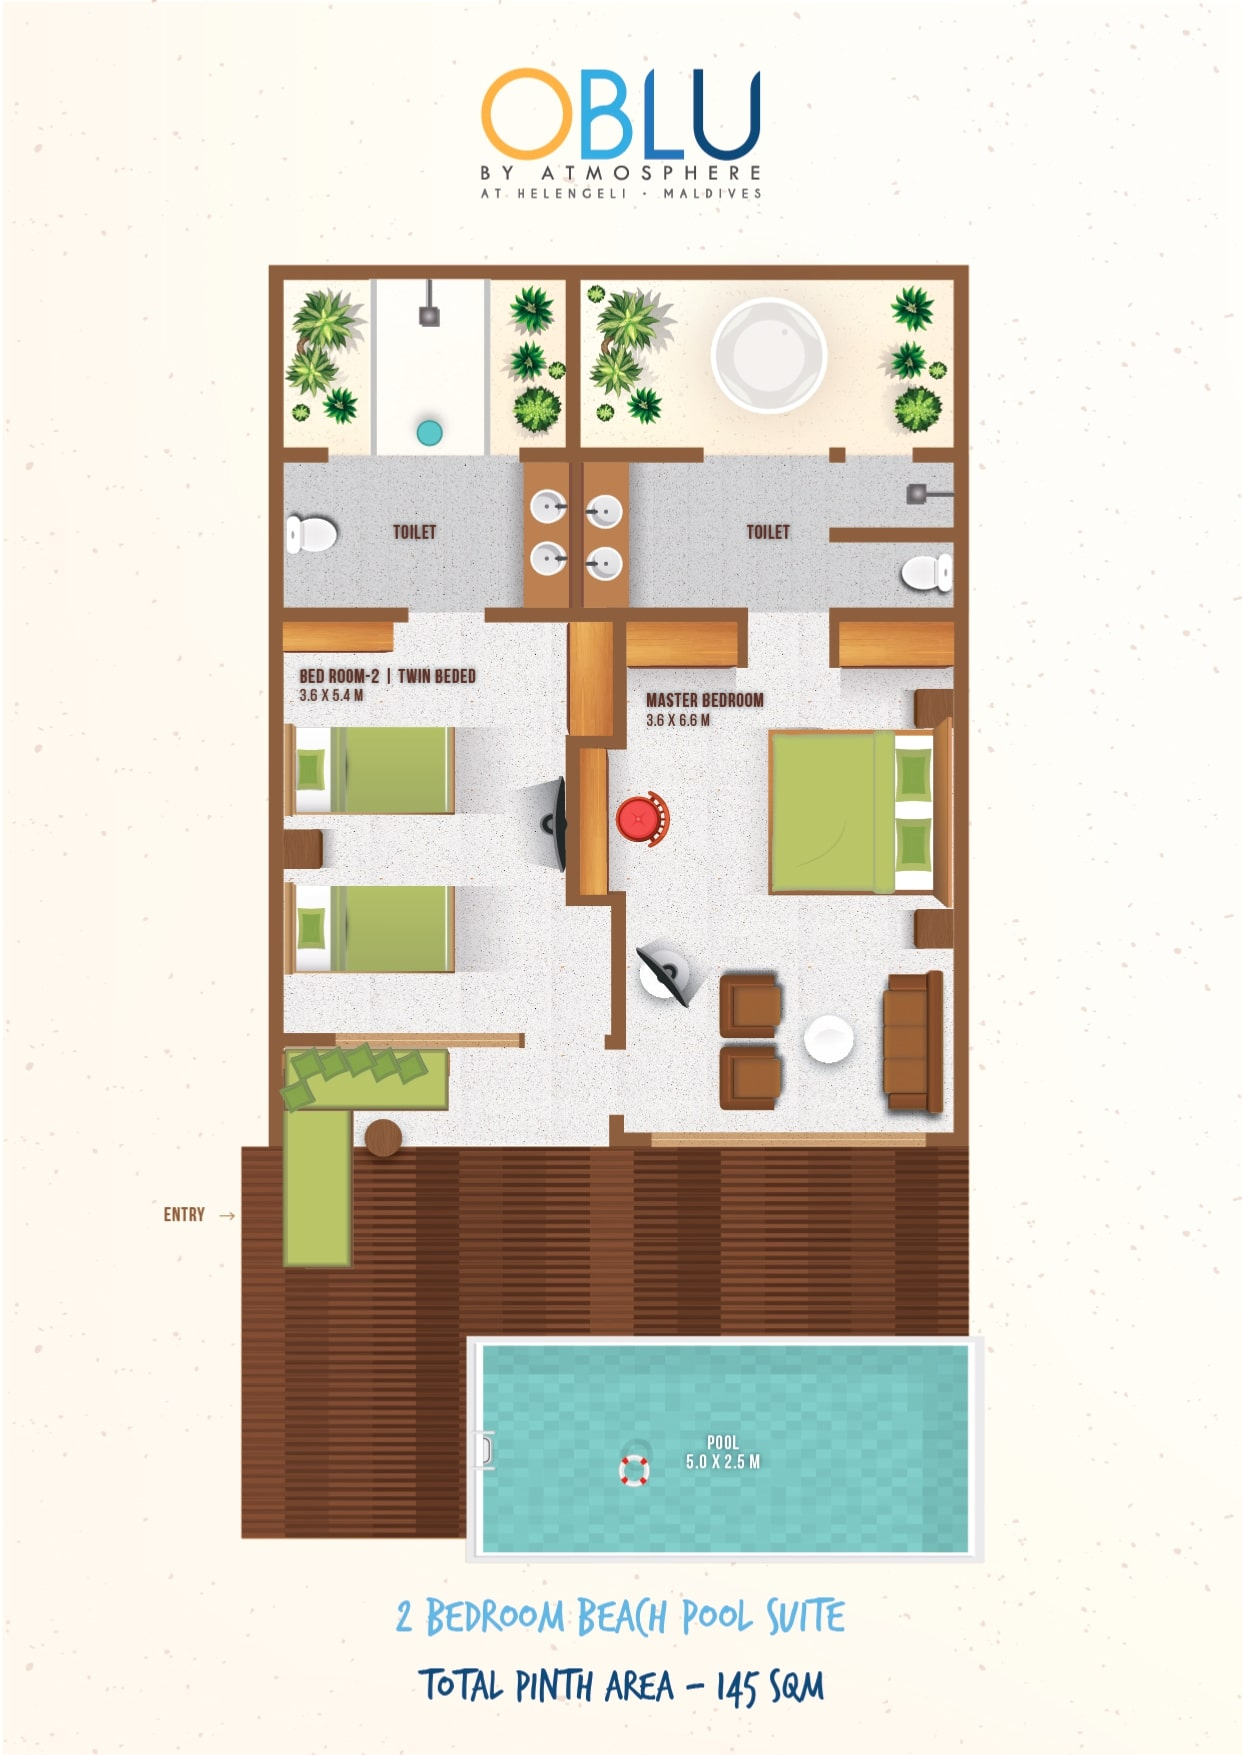 Мальдивы, отель OBLU by Atmosphere at Helengeli, план-схема номера Beach Suite with Pool